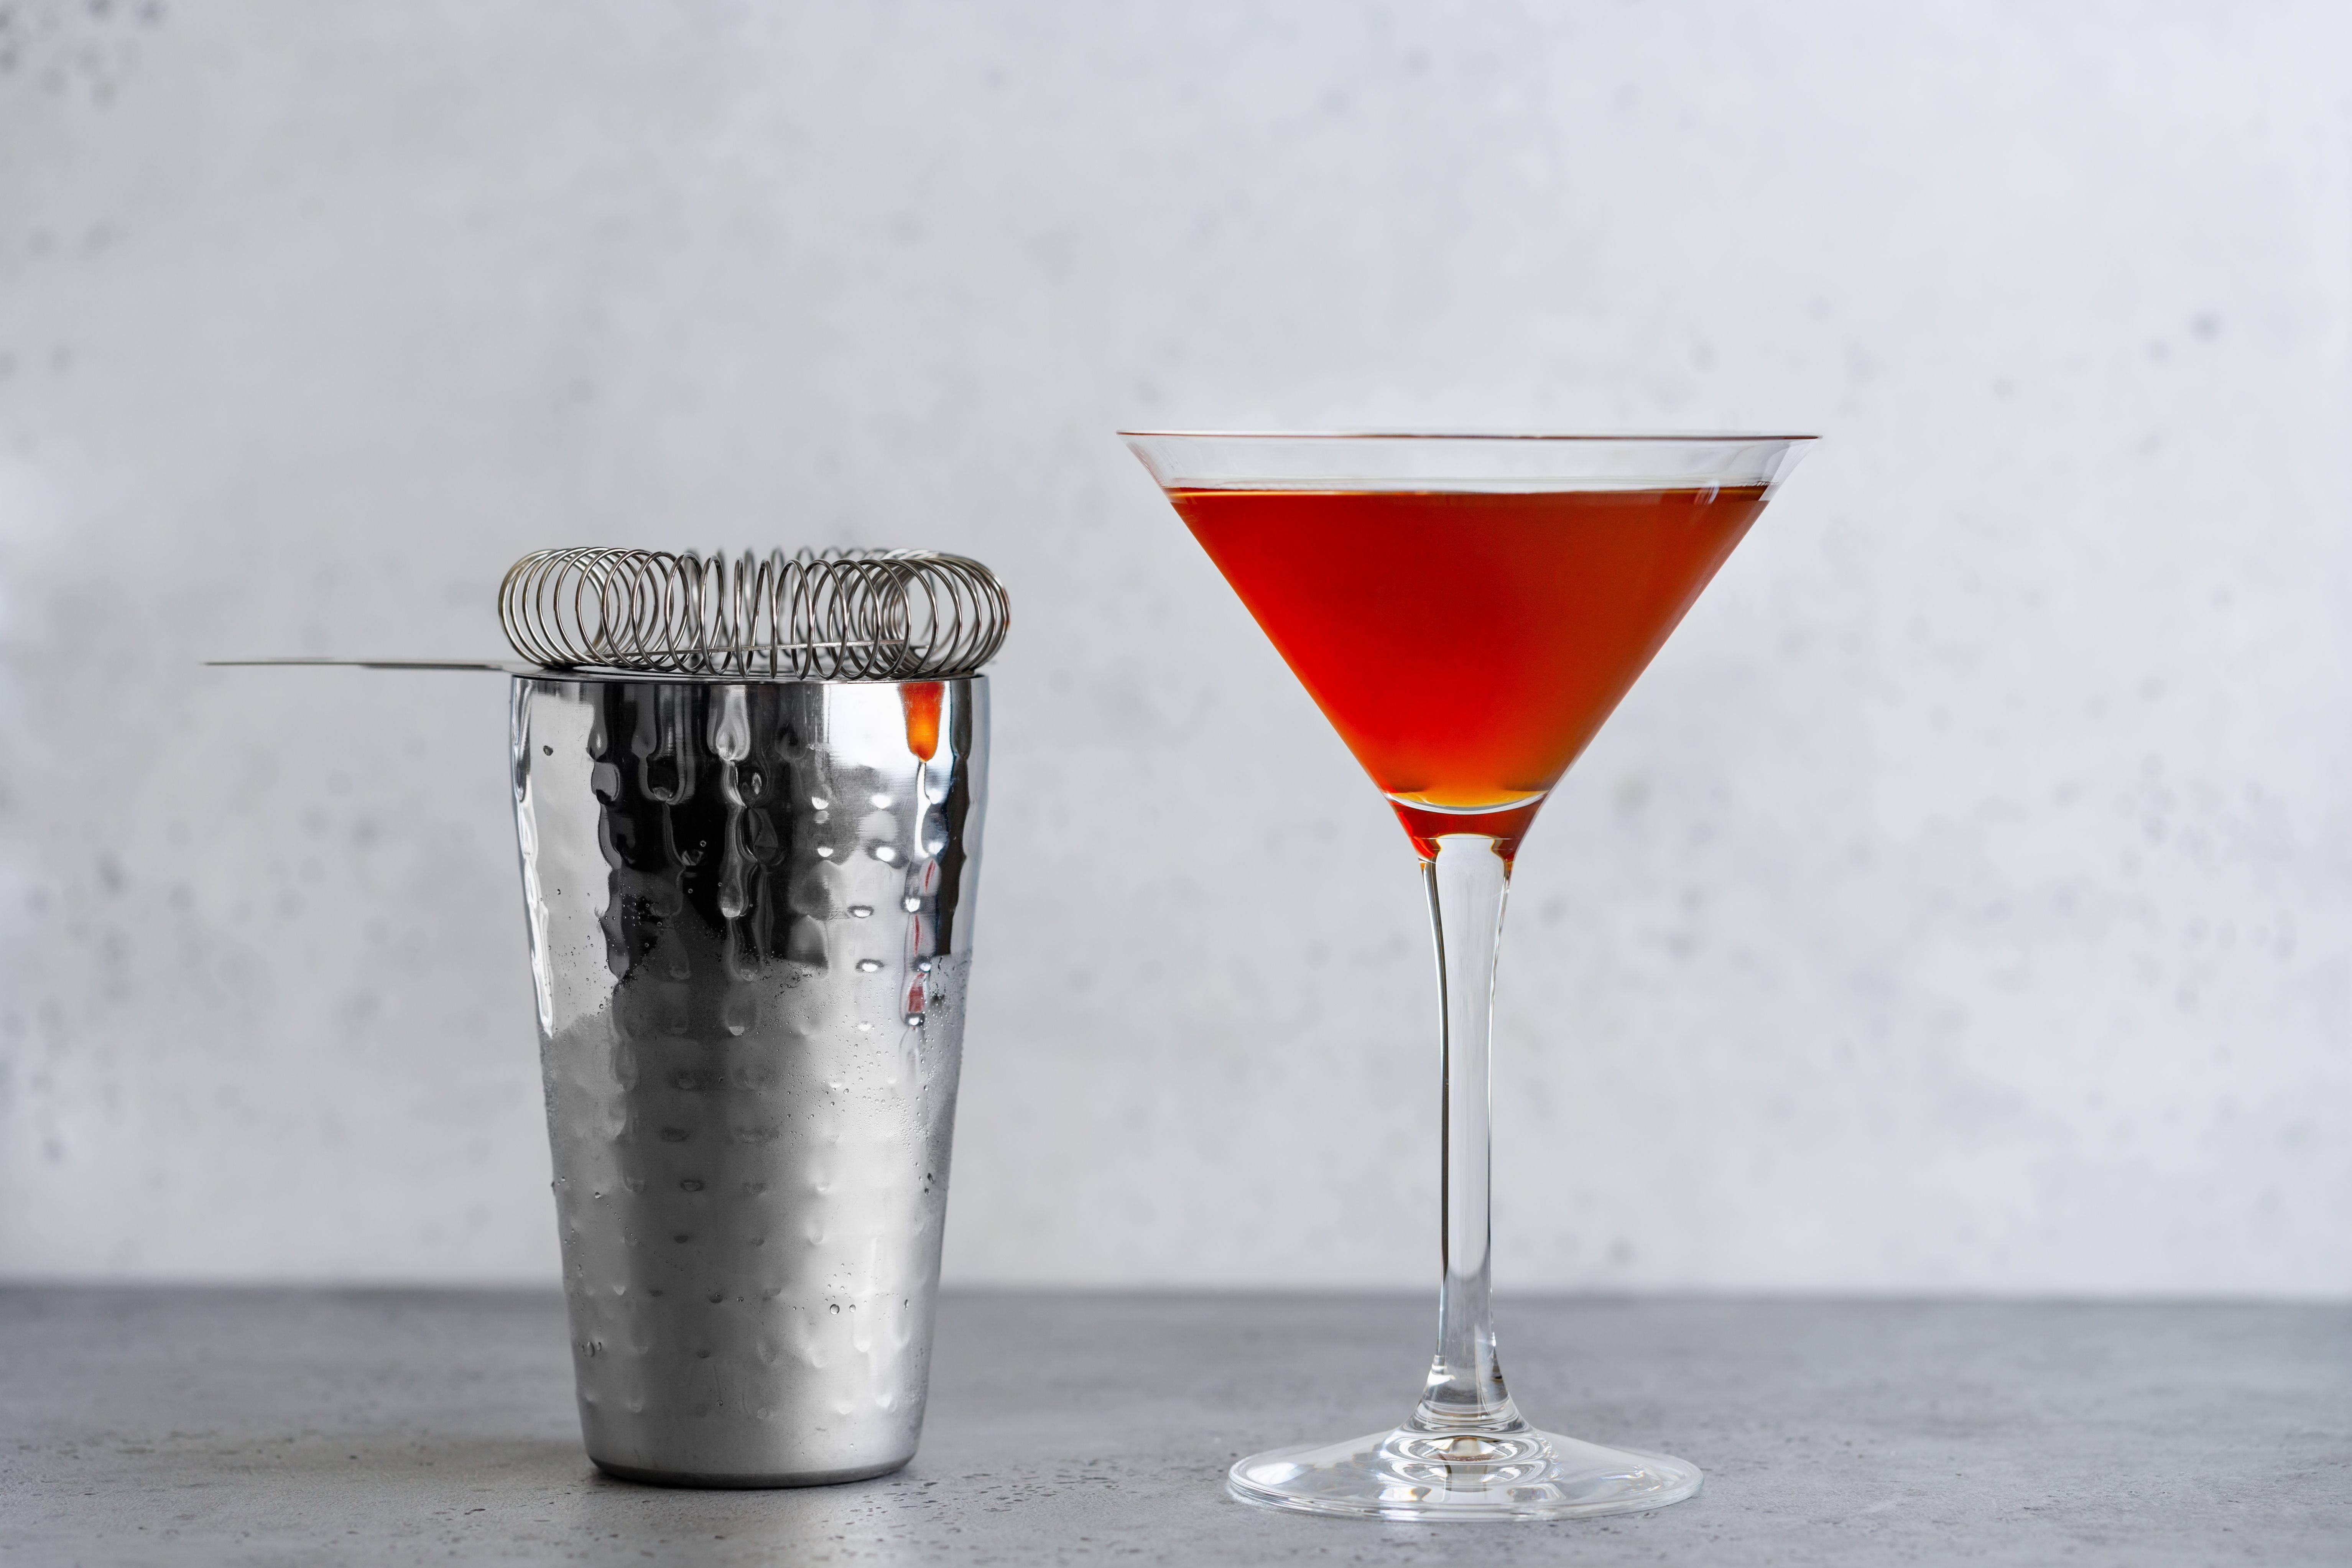 3 рецепта коктейля «манхэттен»: состав и приготовление дома